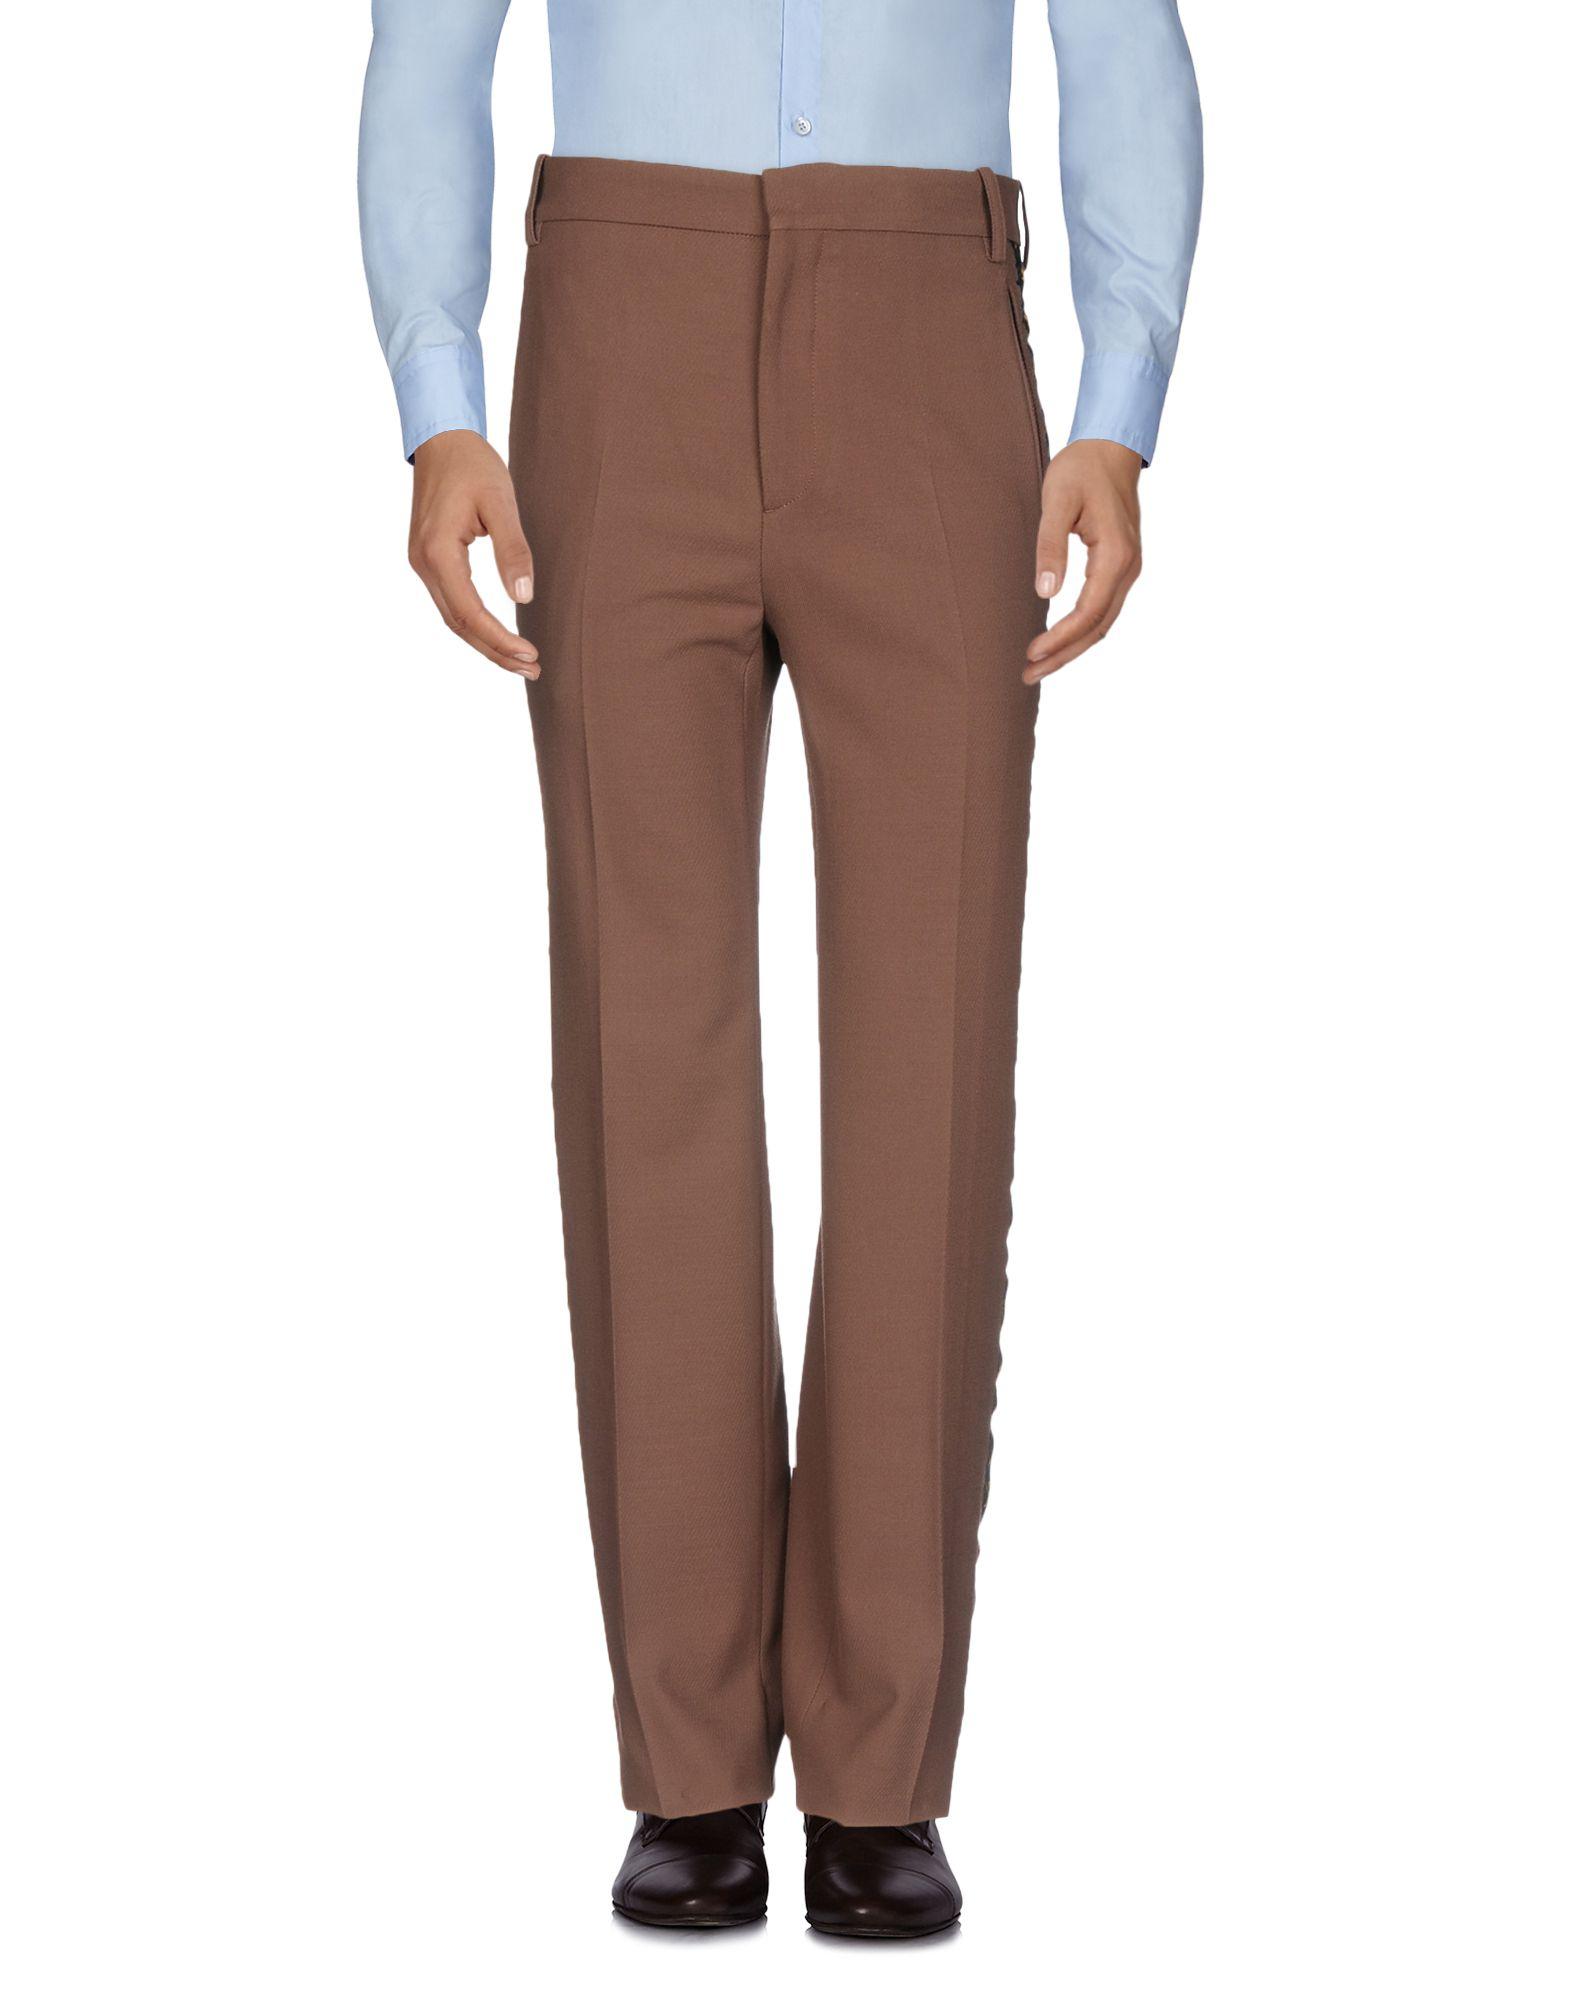 KAPPA x FAITH CONNEXION Повседневные брюки kappa x k way повседневные брюки